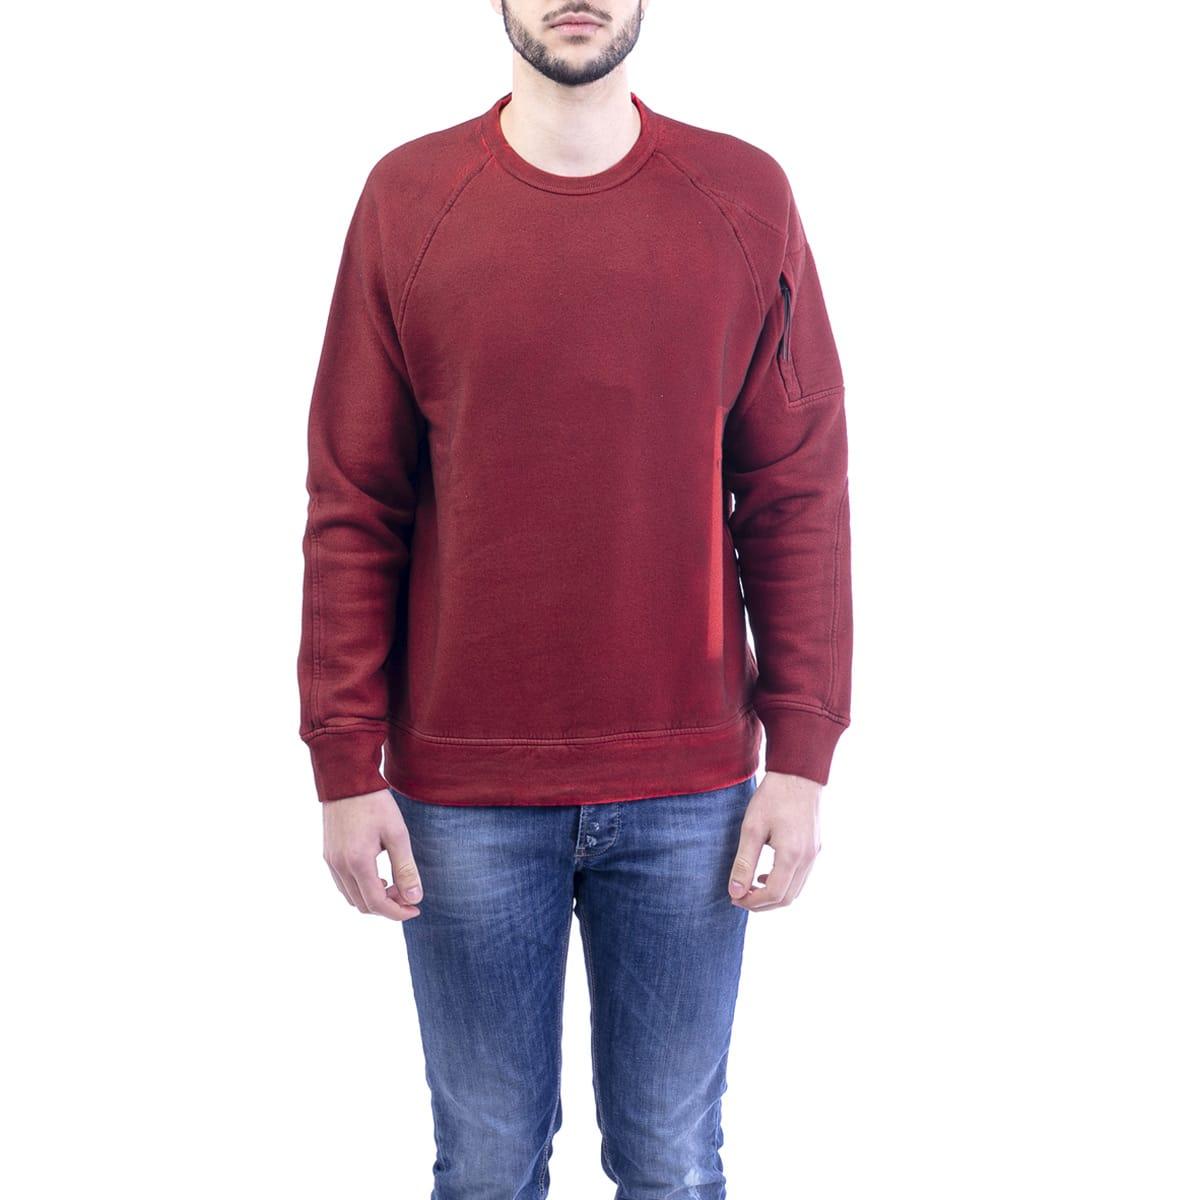 C.P. Company C.p. Company Cotton Sweater